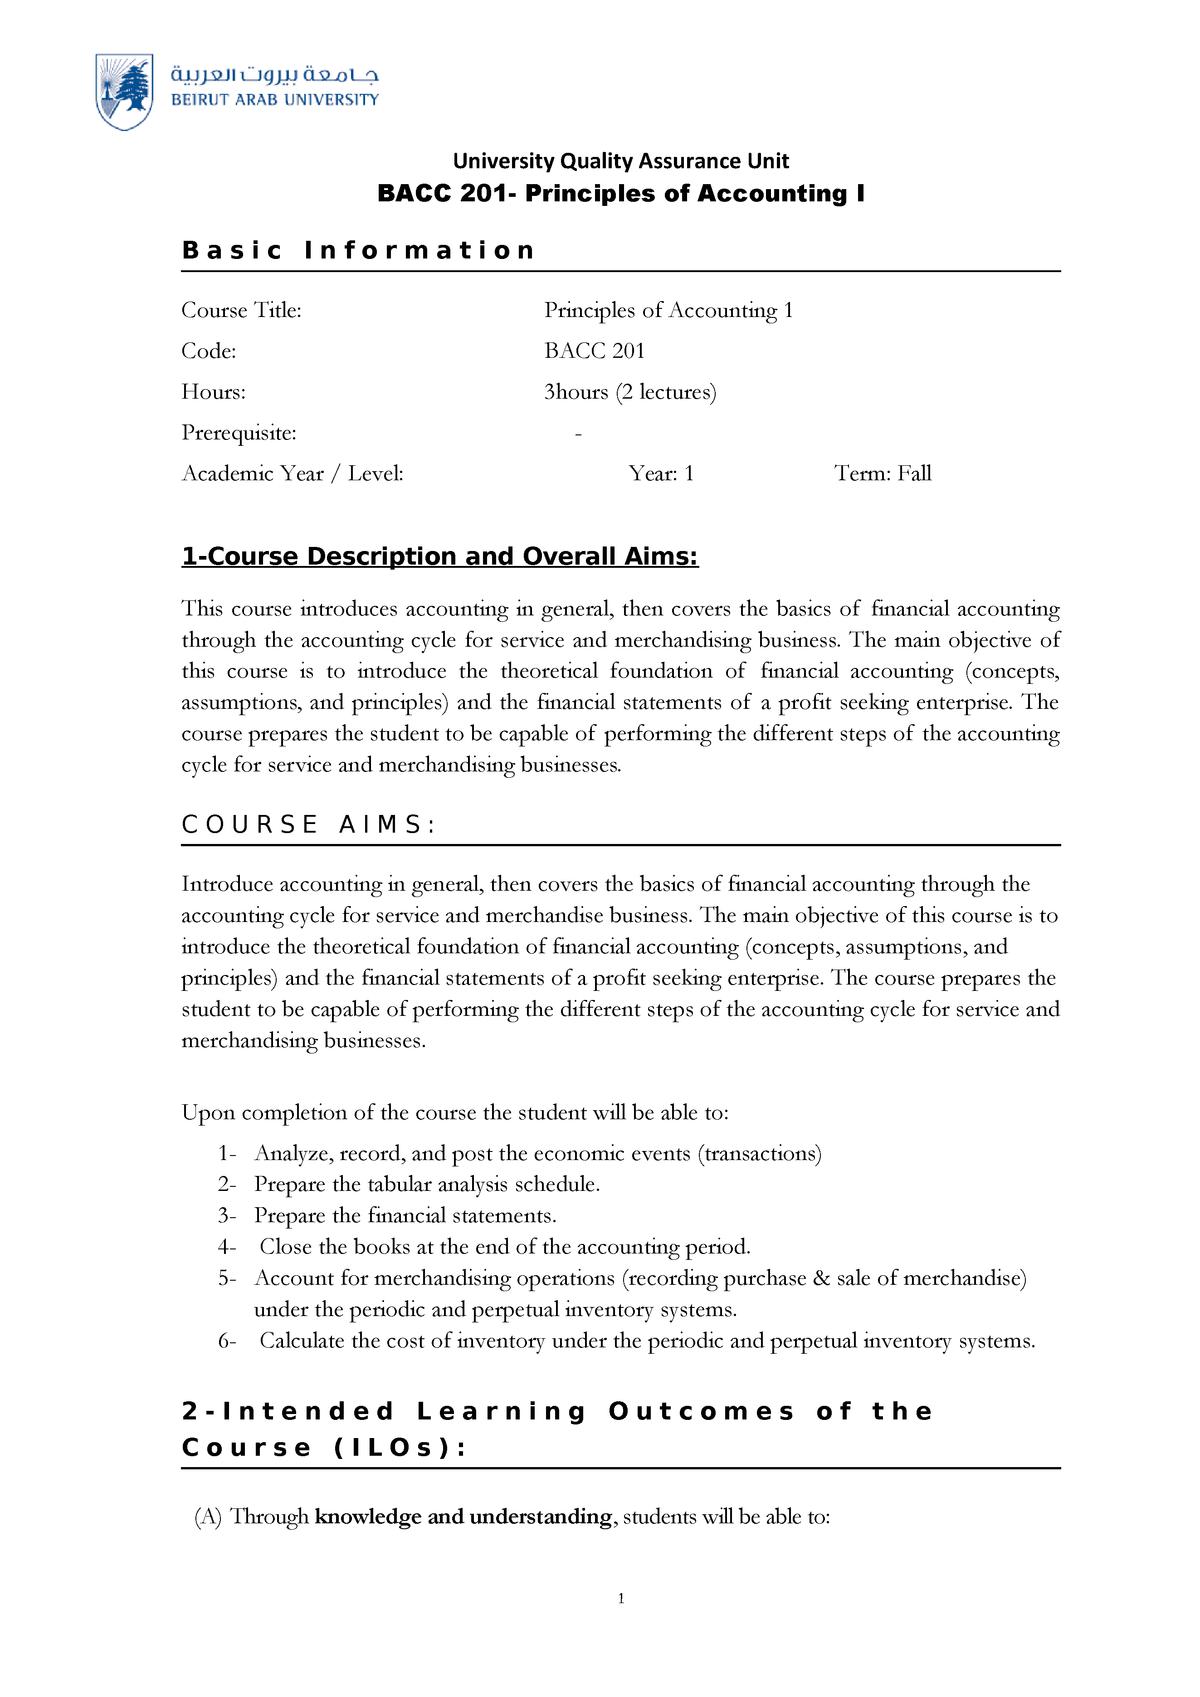 BACC 201-Course specification - BMTH201: Business Math - StuDocu